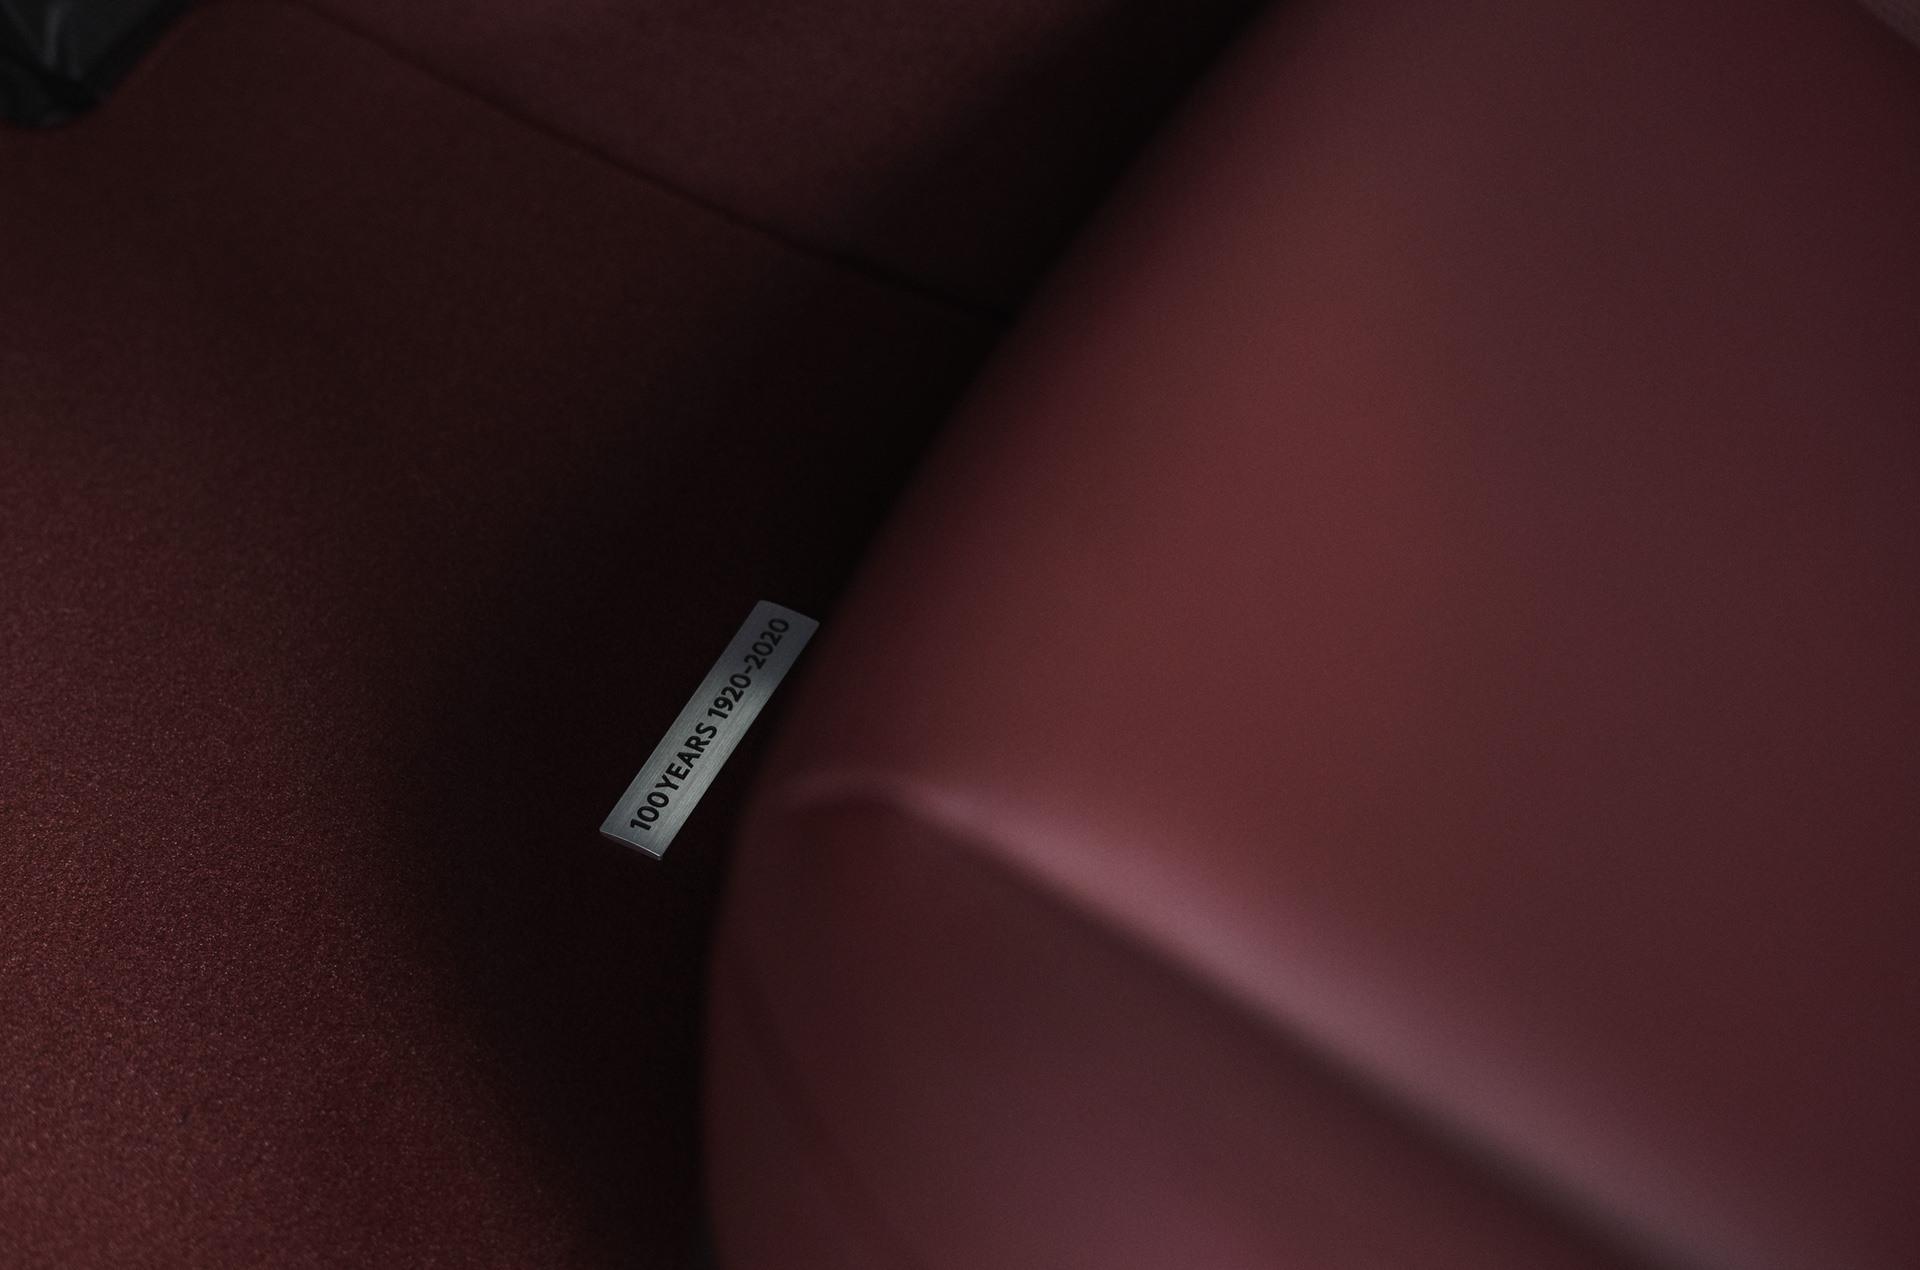 2020_100thSV_BRD12_EU_LHD_Mazda3_Floormat